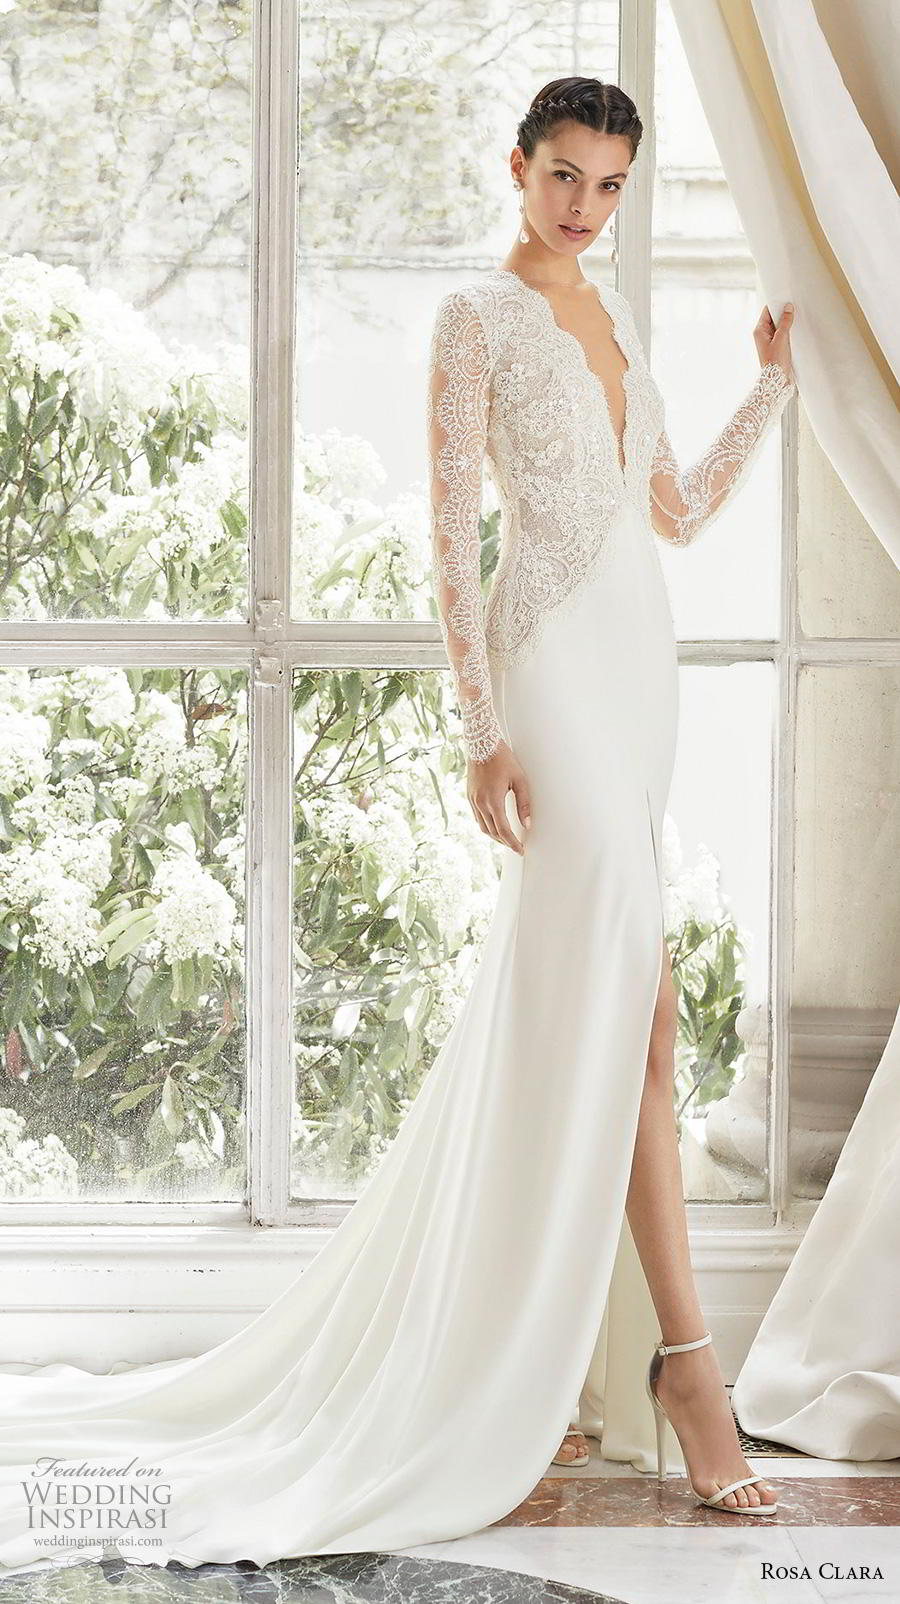 rosa clara 2019 couture bridal long sleeves deep v neck heavily embellished bodice slit skirt elegant sheath wedding dress backless v back chapel train (5) mv